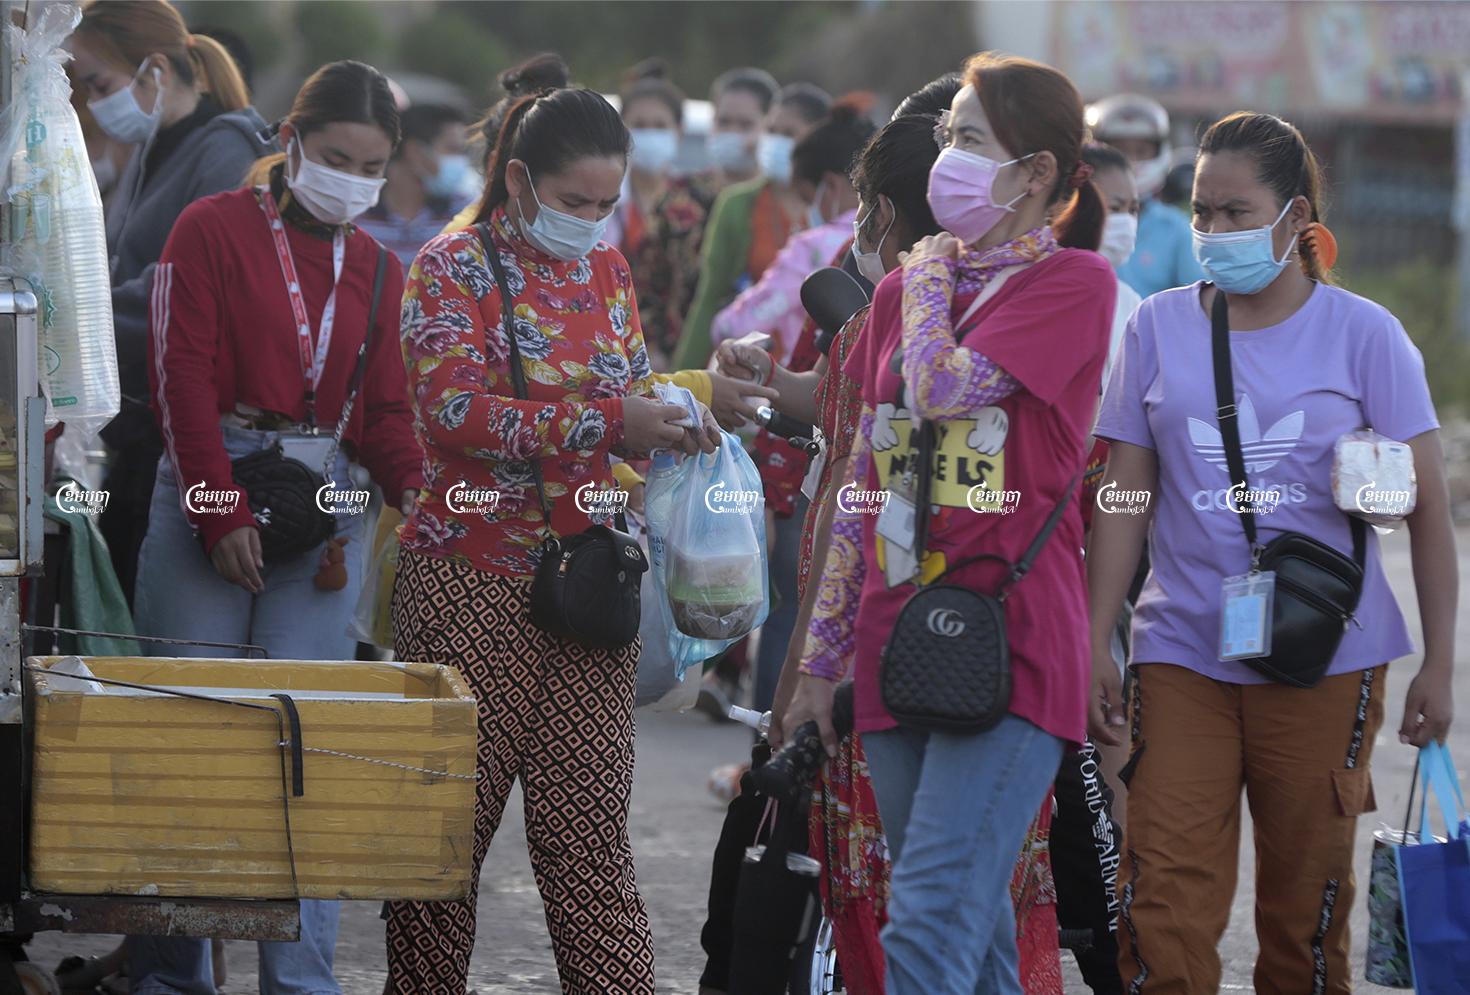 Garment workers arrive at their factory at Kakap II commune, Pur Senchey district in Phnom Penh, June 14, 2021. CamboJA/ Panha Chhorpoan